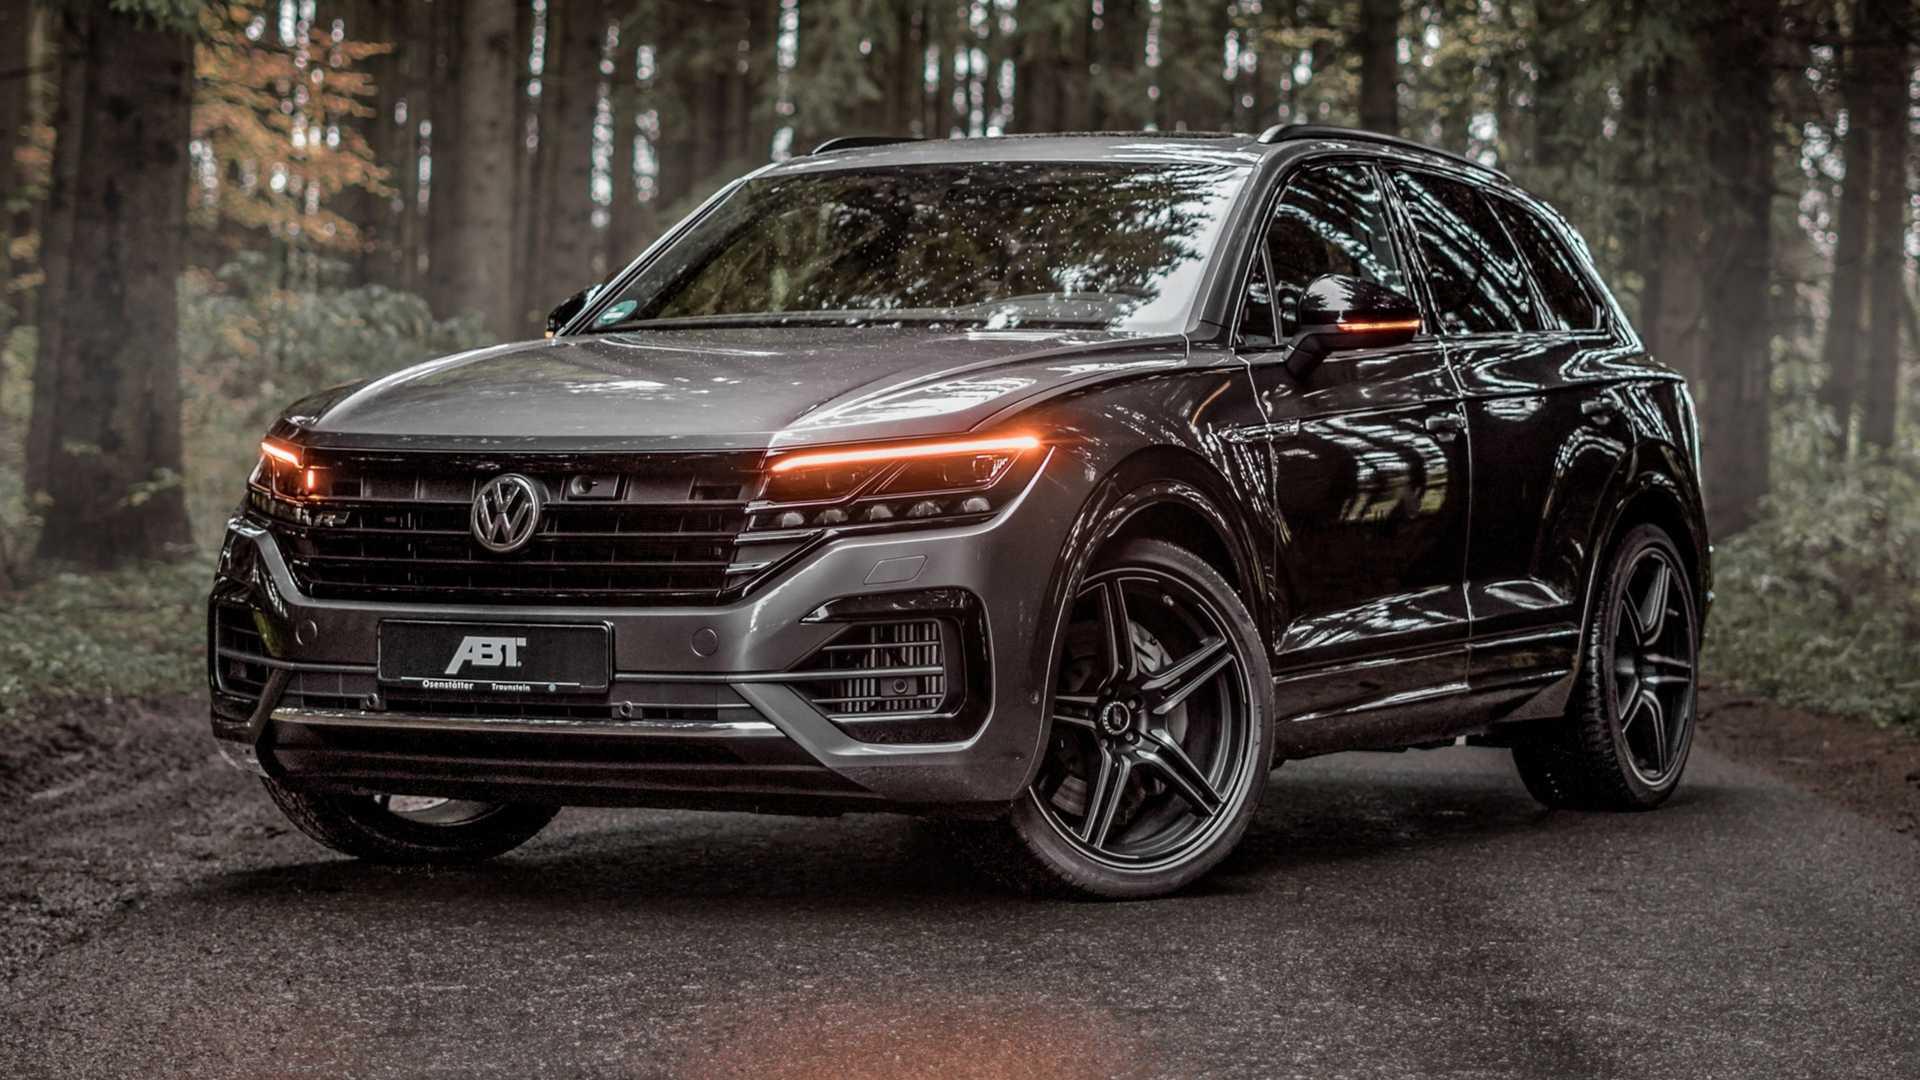 Volkswagen-Touareg-V8-TDI-by-ABT-5